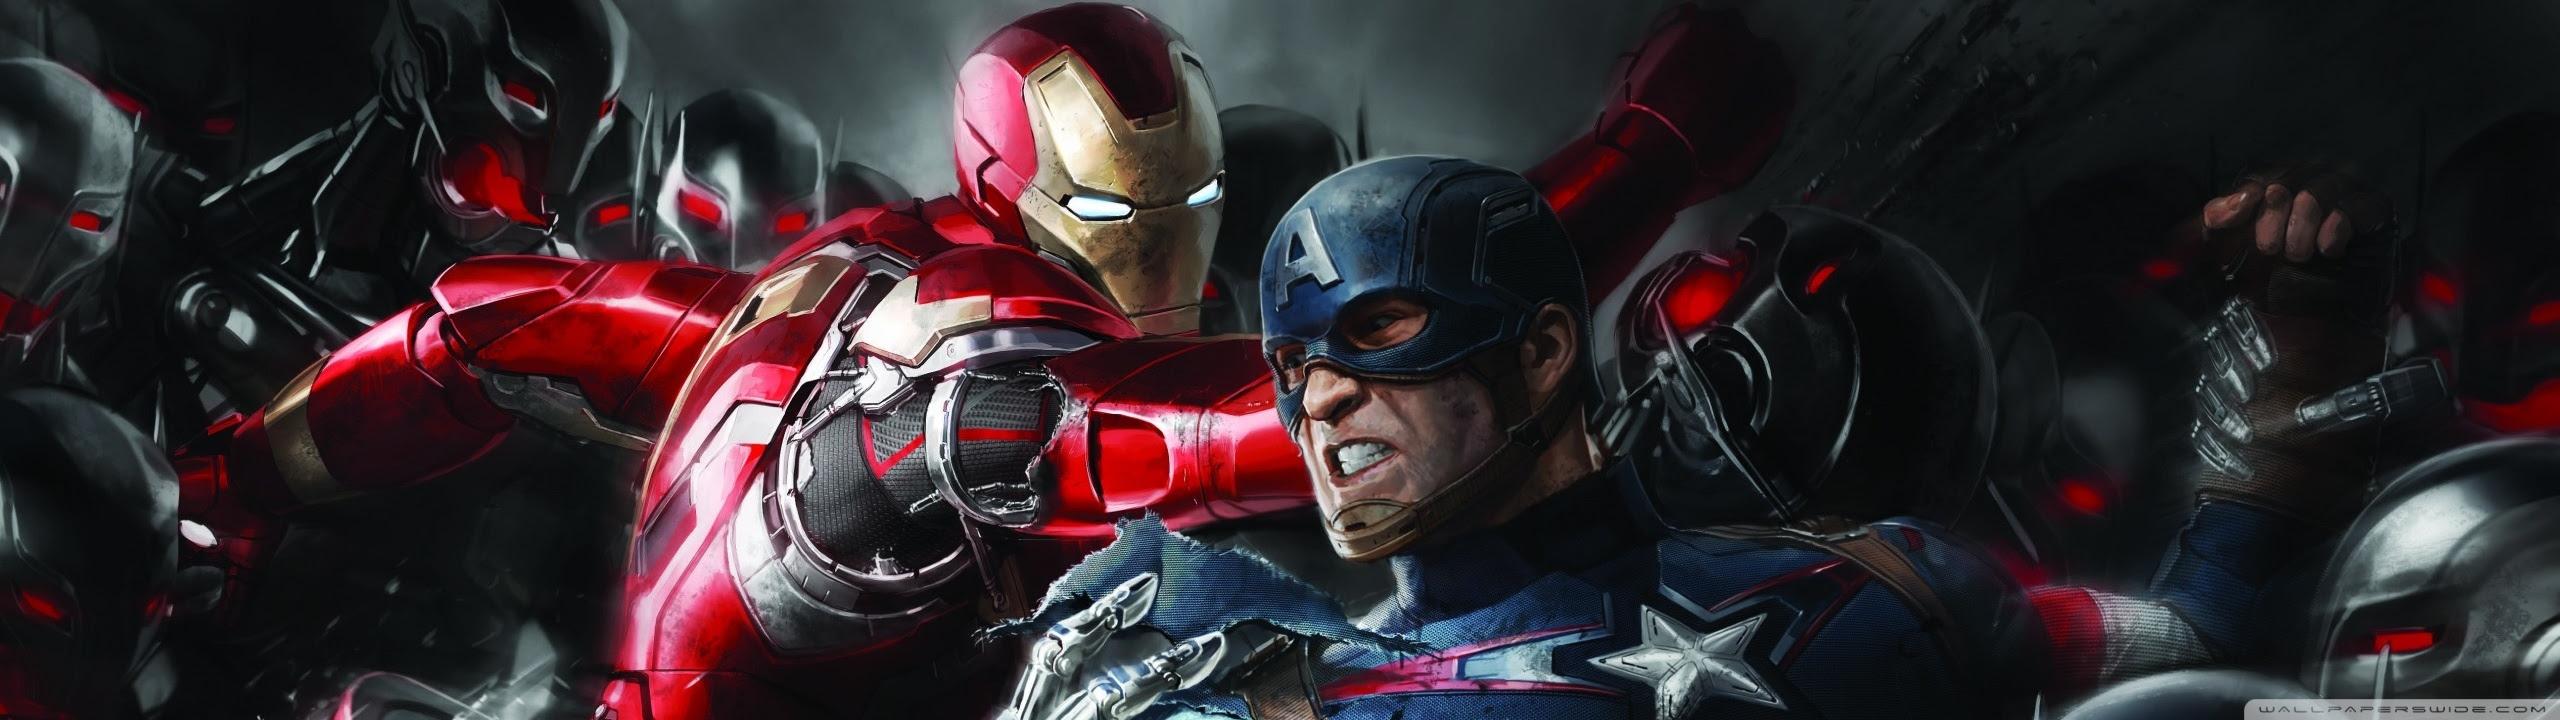 Captain America 3 Ultra Hd Desktop Background Wallpaper For